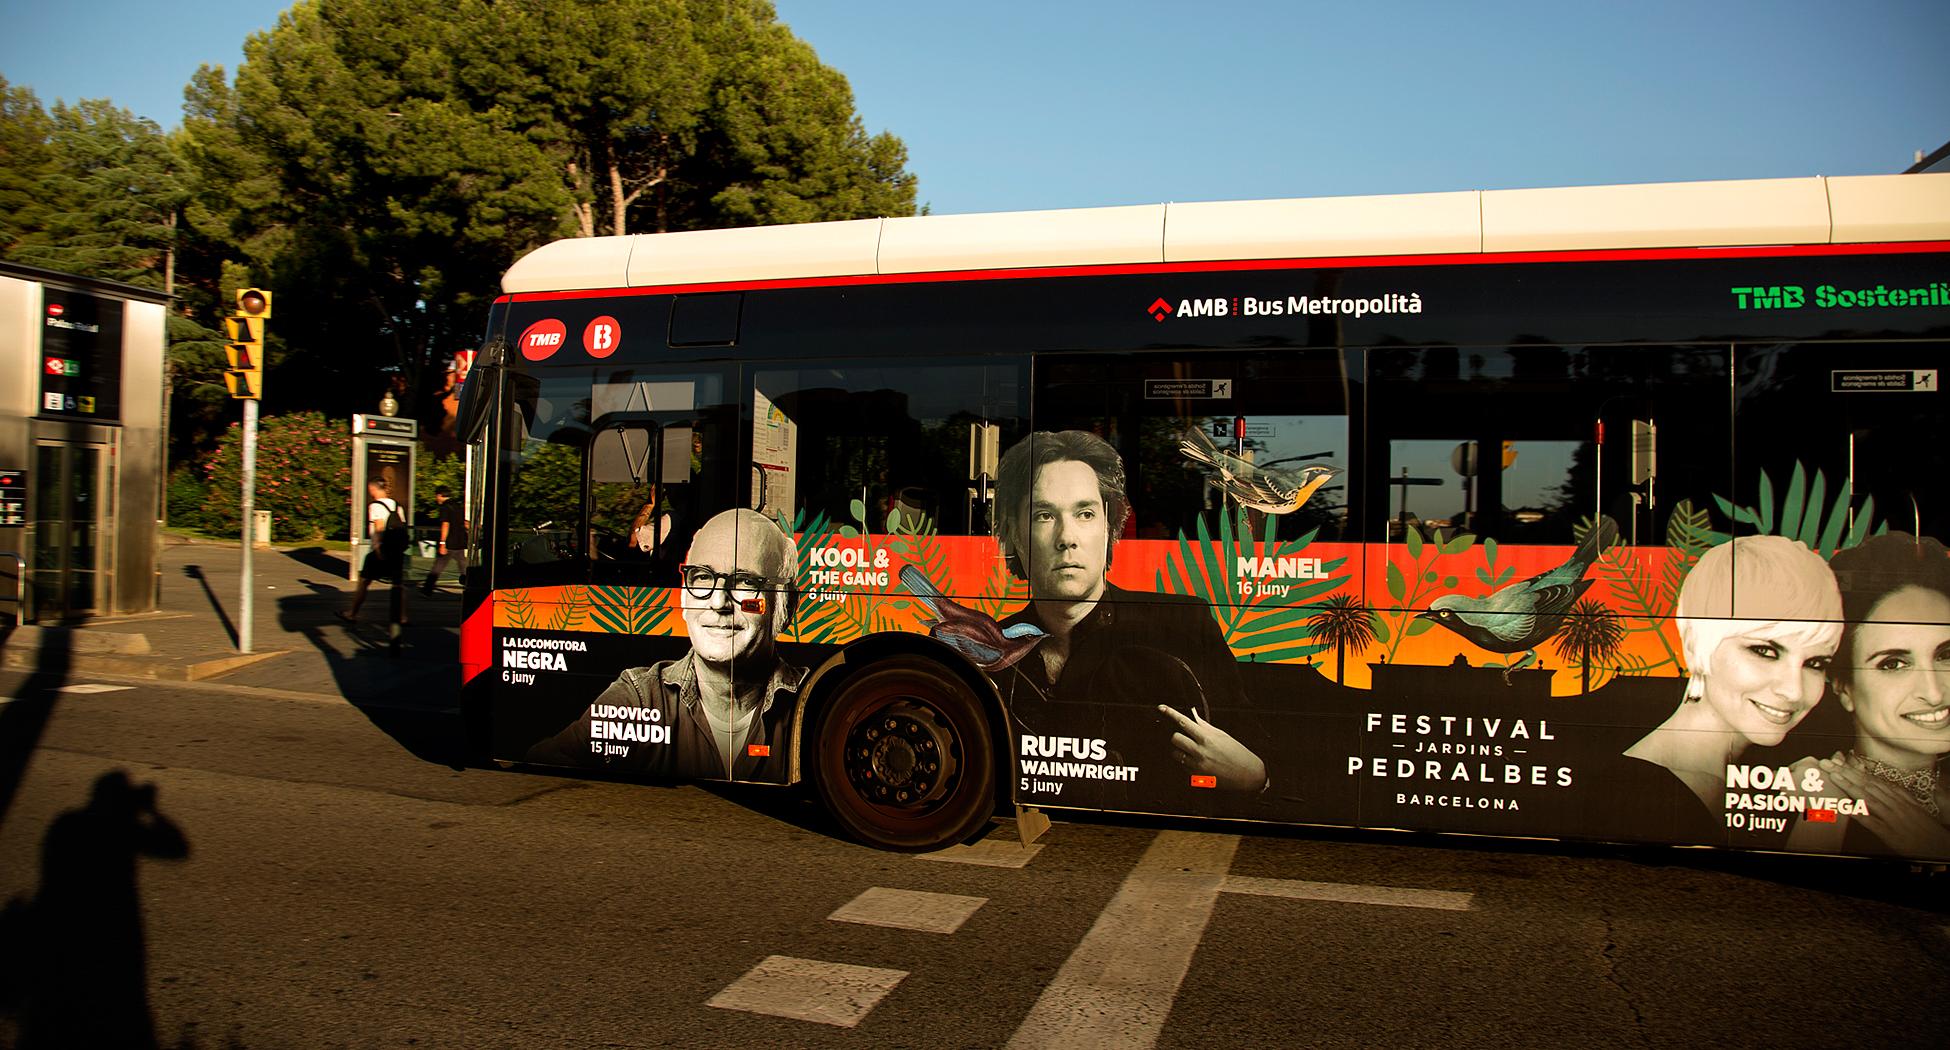 02autobus